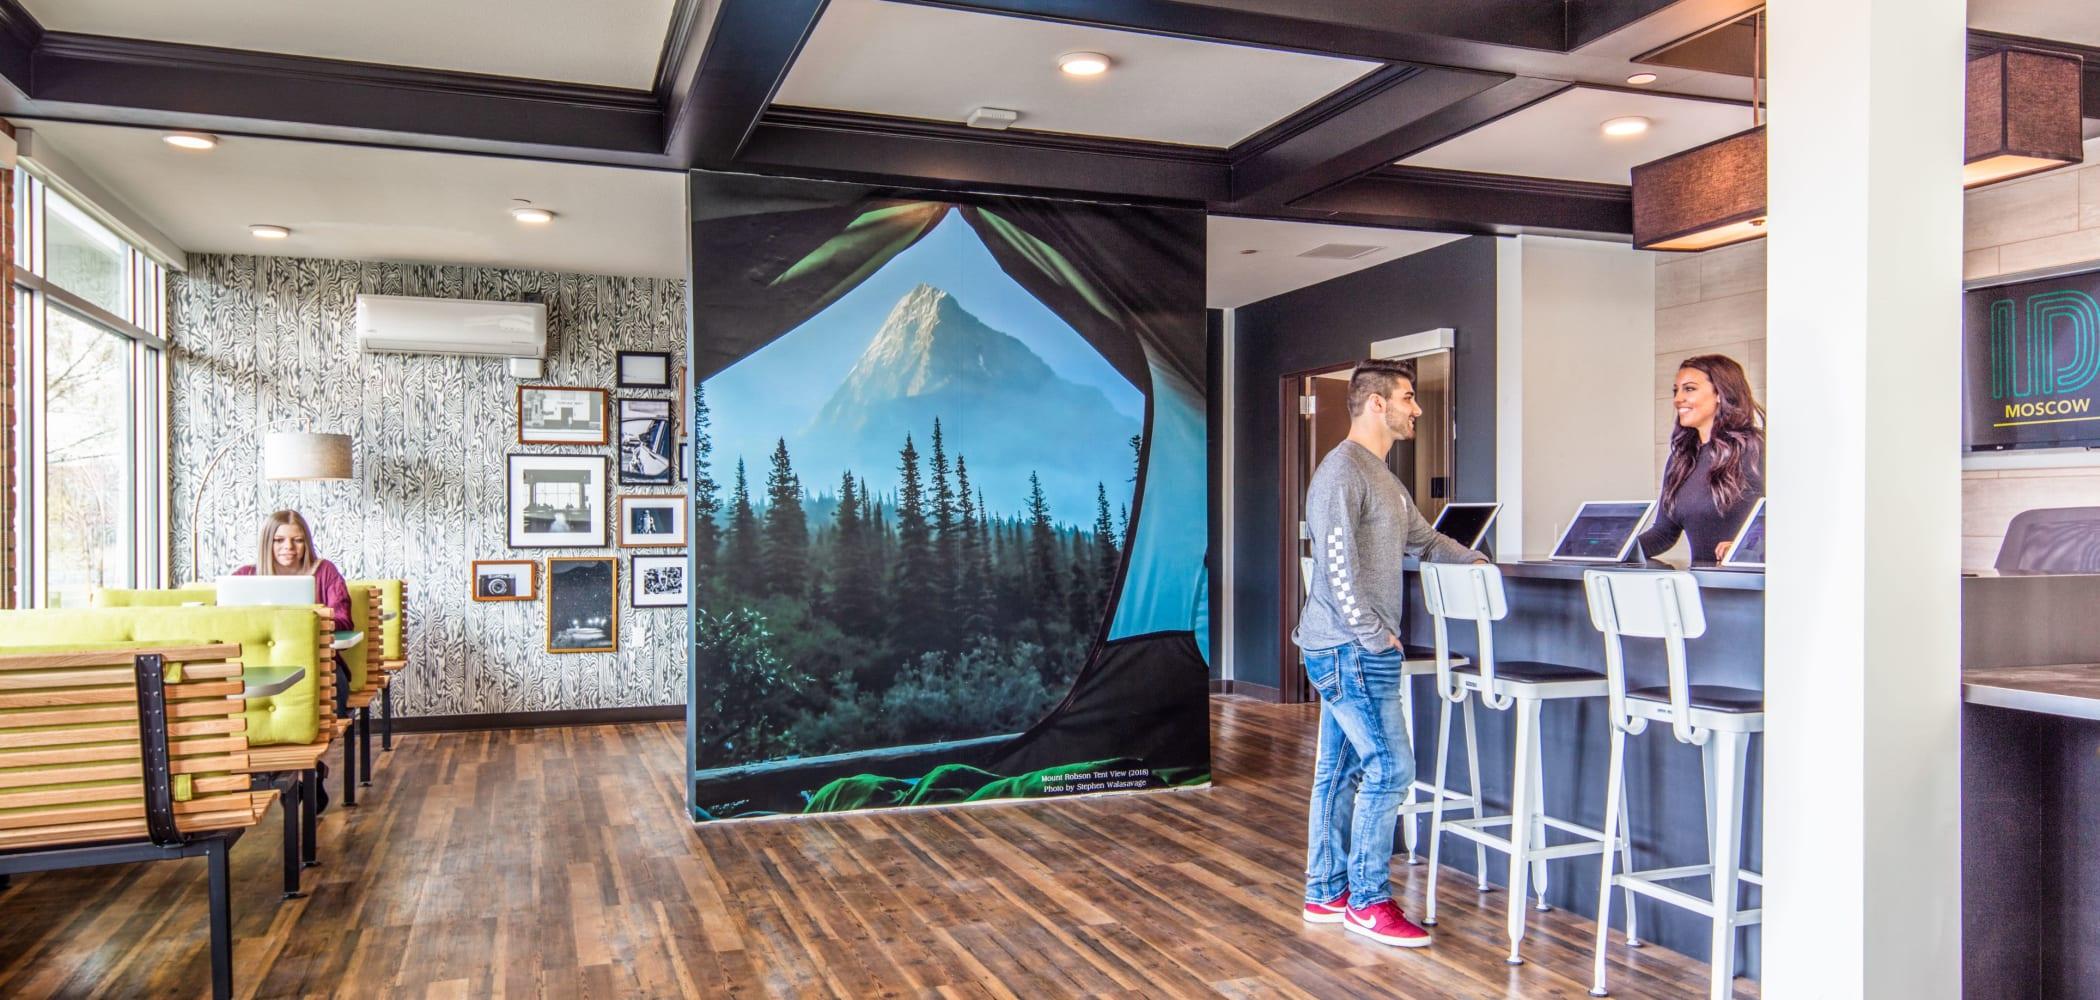 Lobby at IDENTITY Moscow in Moscow, Idaho